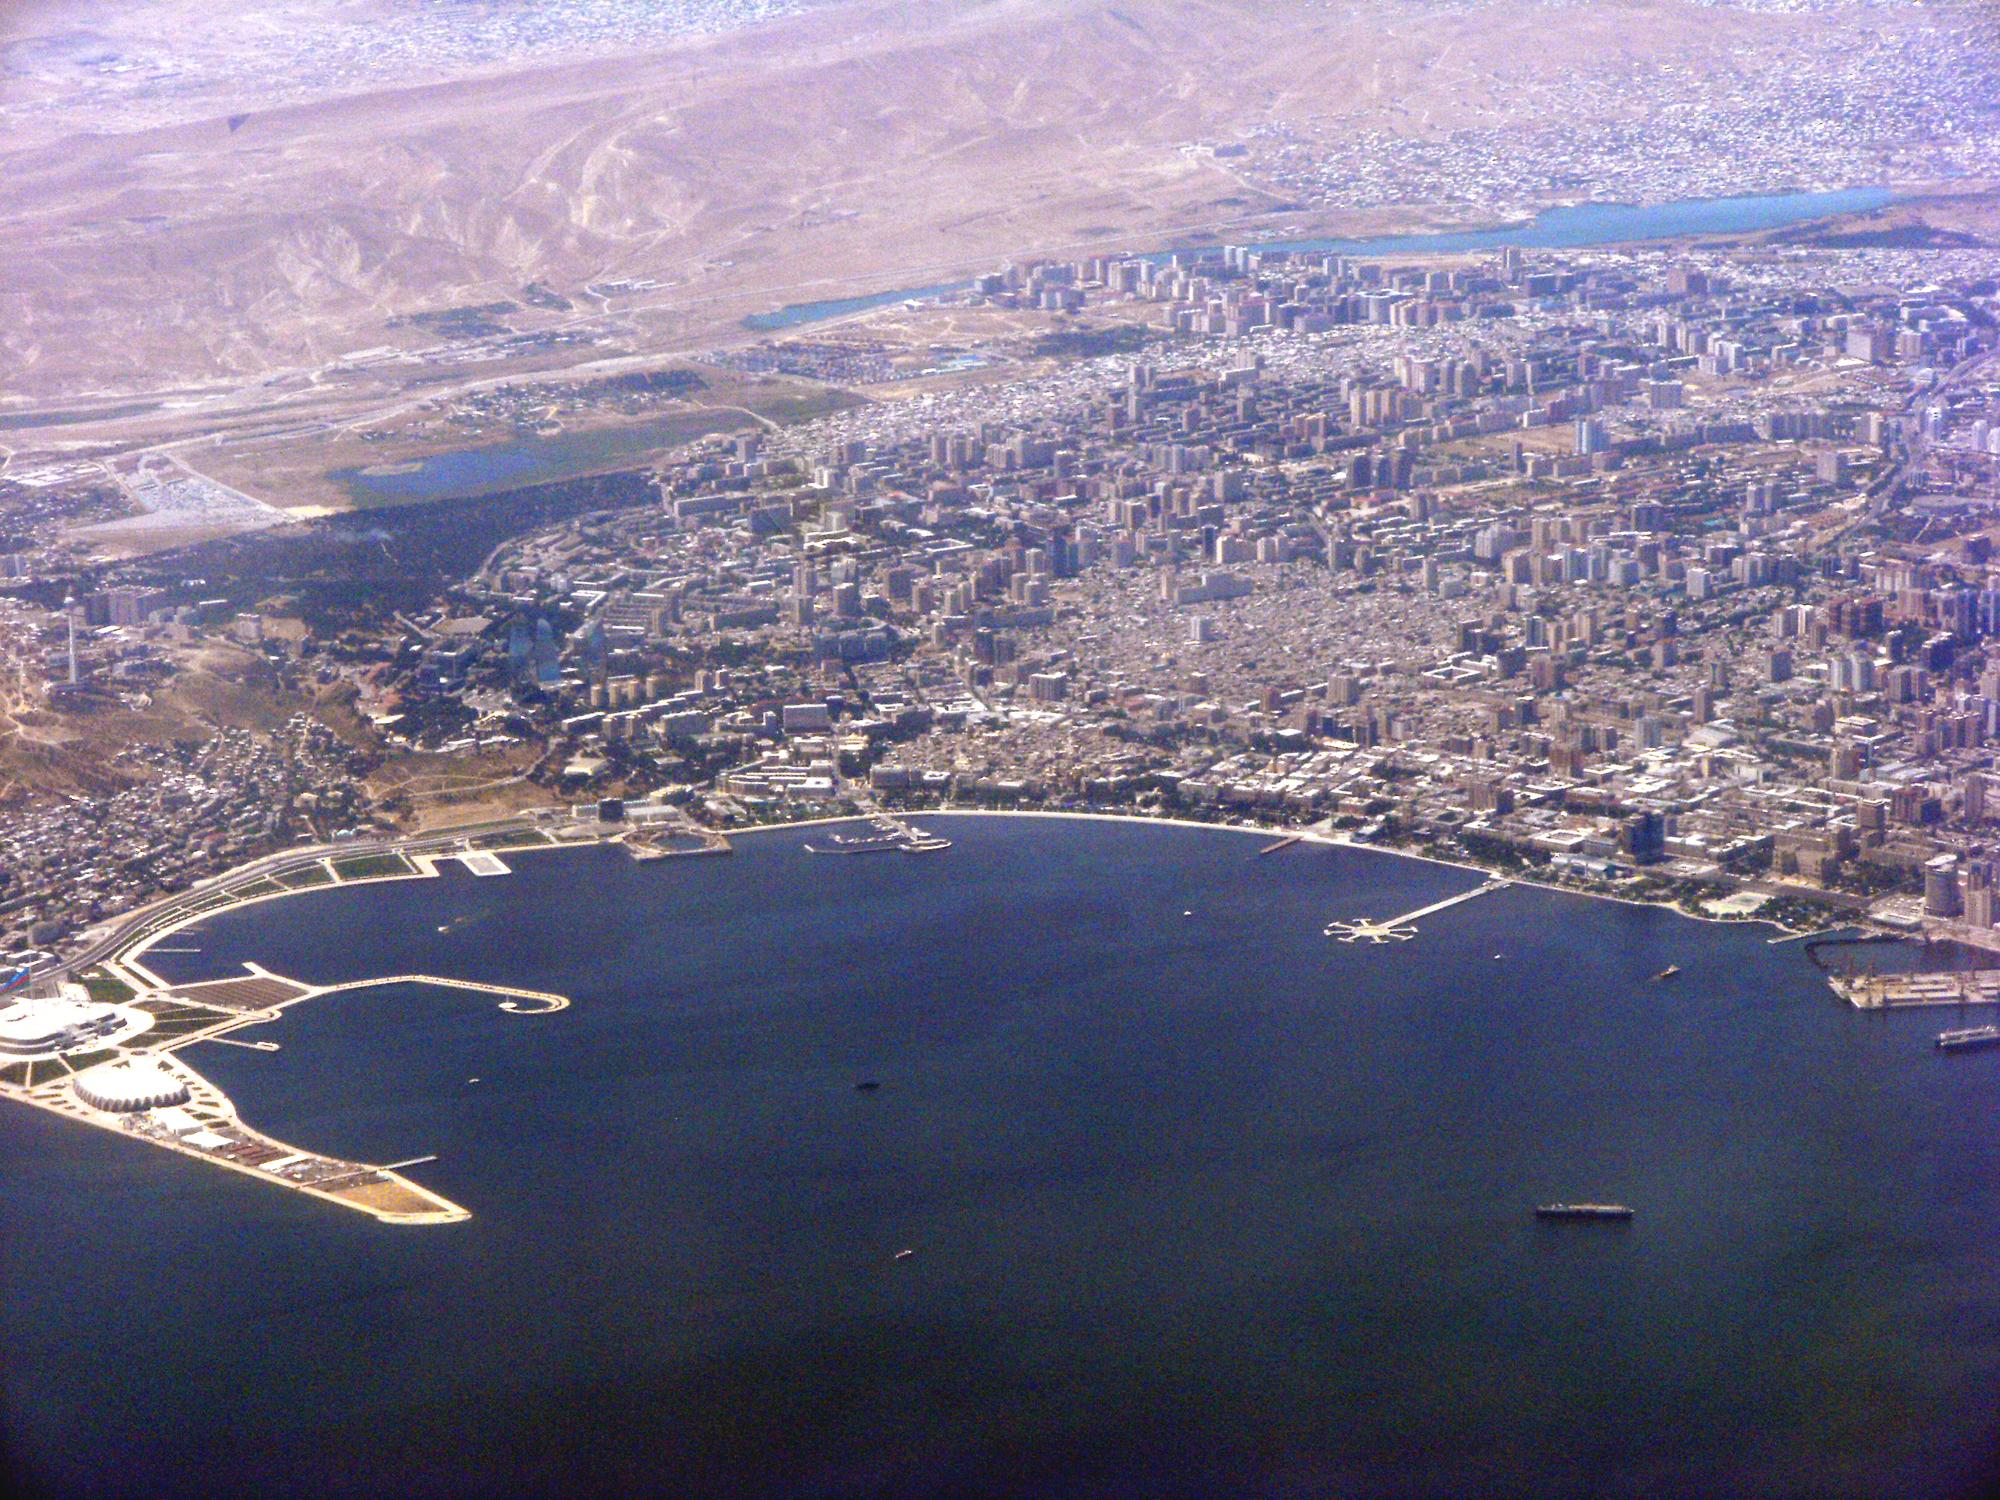 vue aérienne de la baie de Bakou